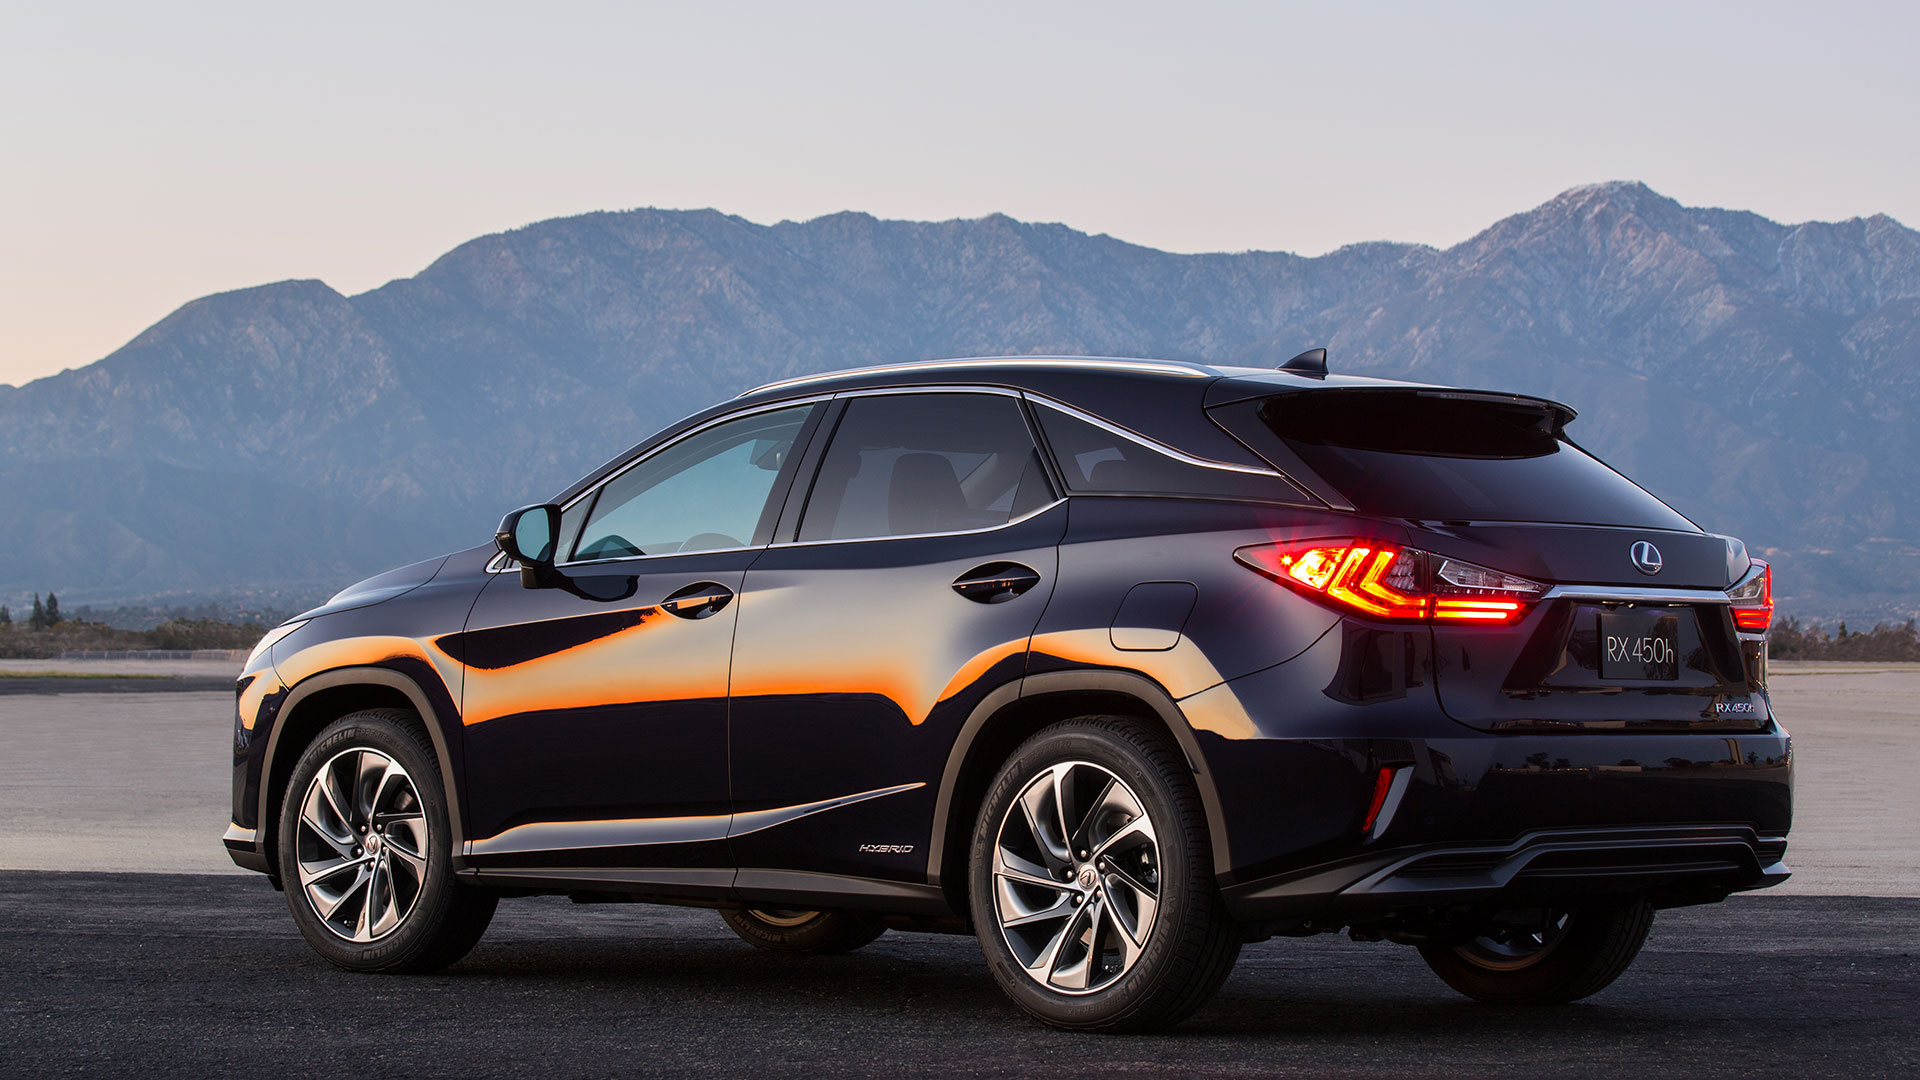 Lexus RX 450h hero asset